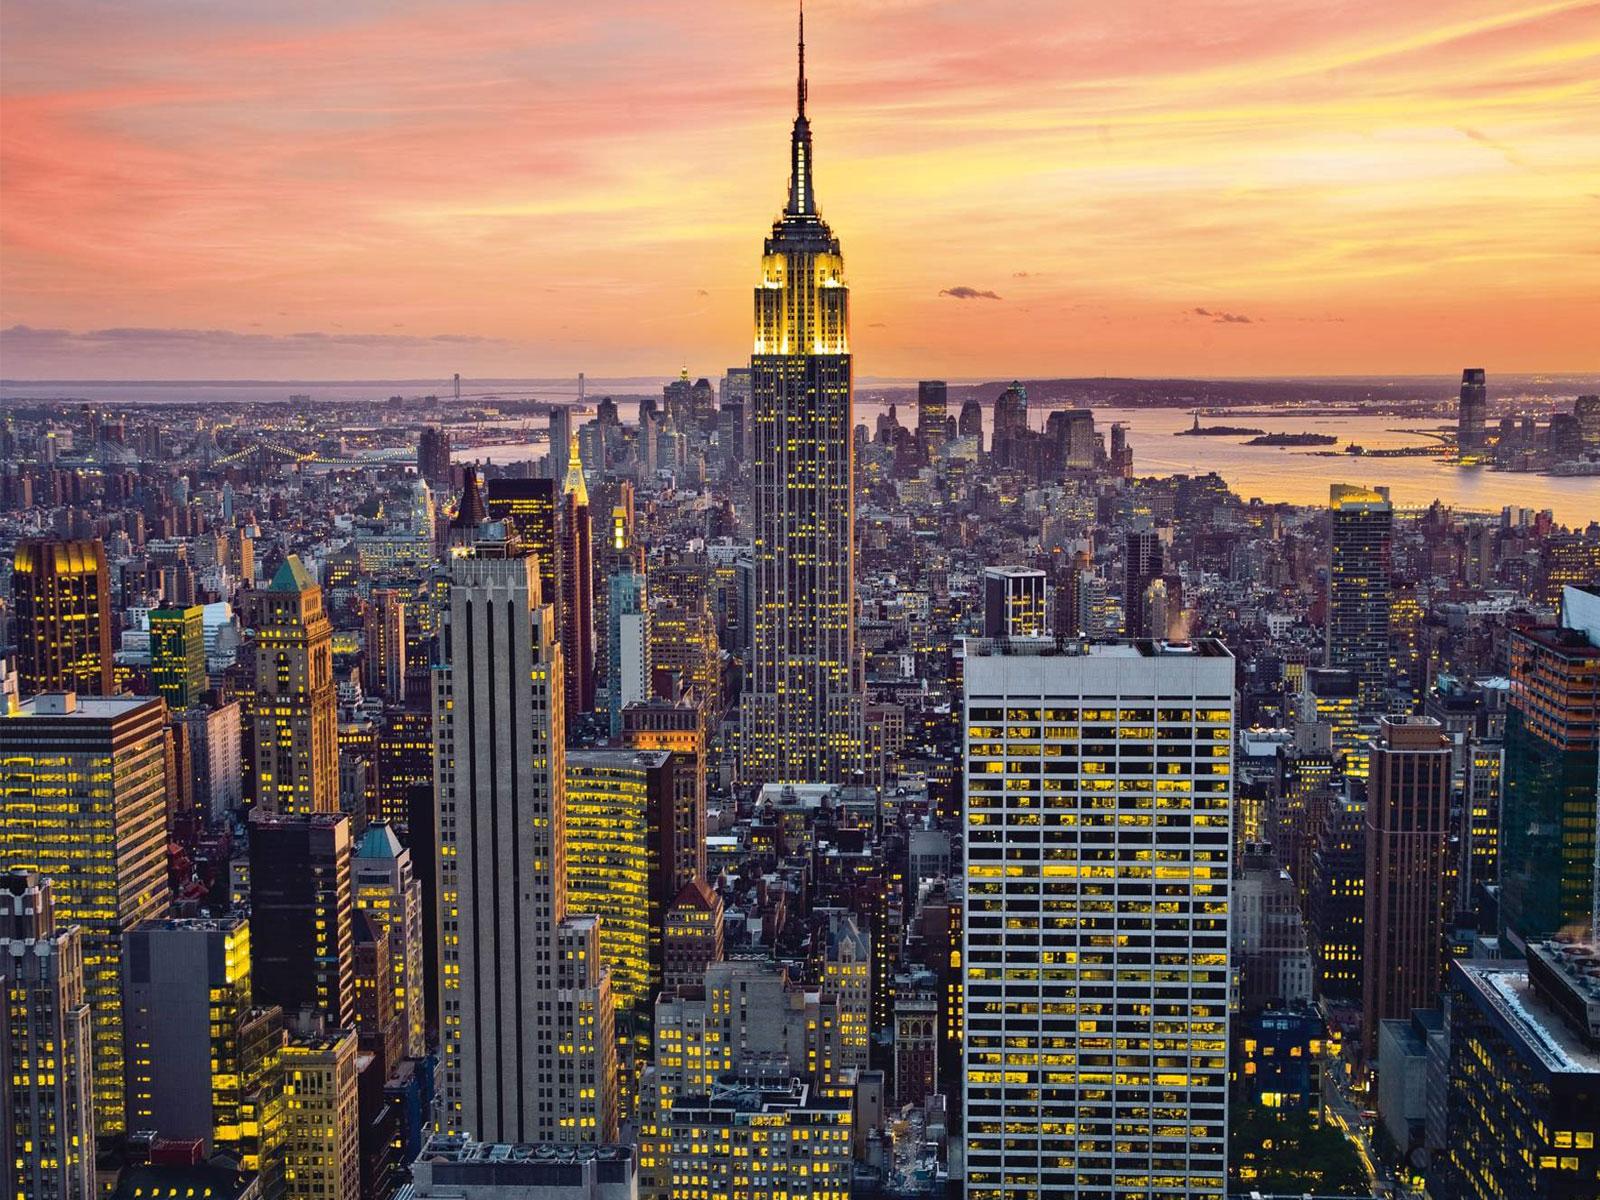 Free Download New York 1080p Wallpaper 1600x1200 For Your Desktop Mobile Tablet Explore 26 New York Wallpaper Hd 1080p New York Wallpaper Hd 1080p New York 1080p Wallpaper Hd